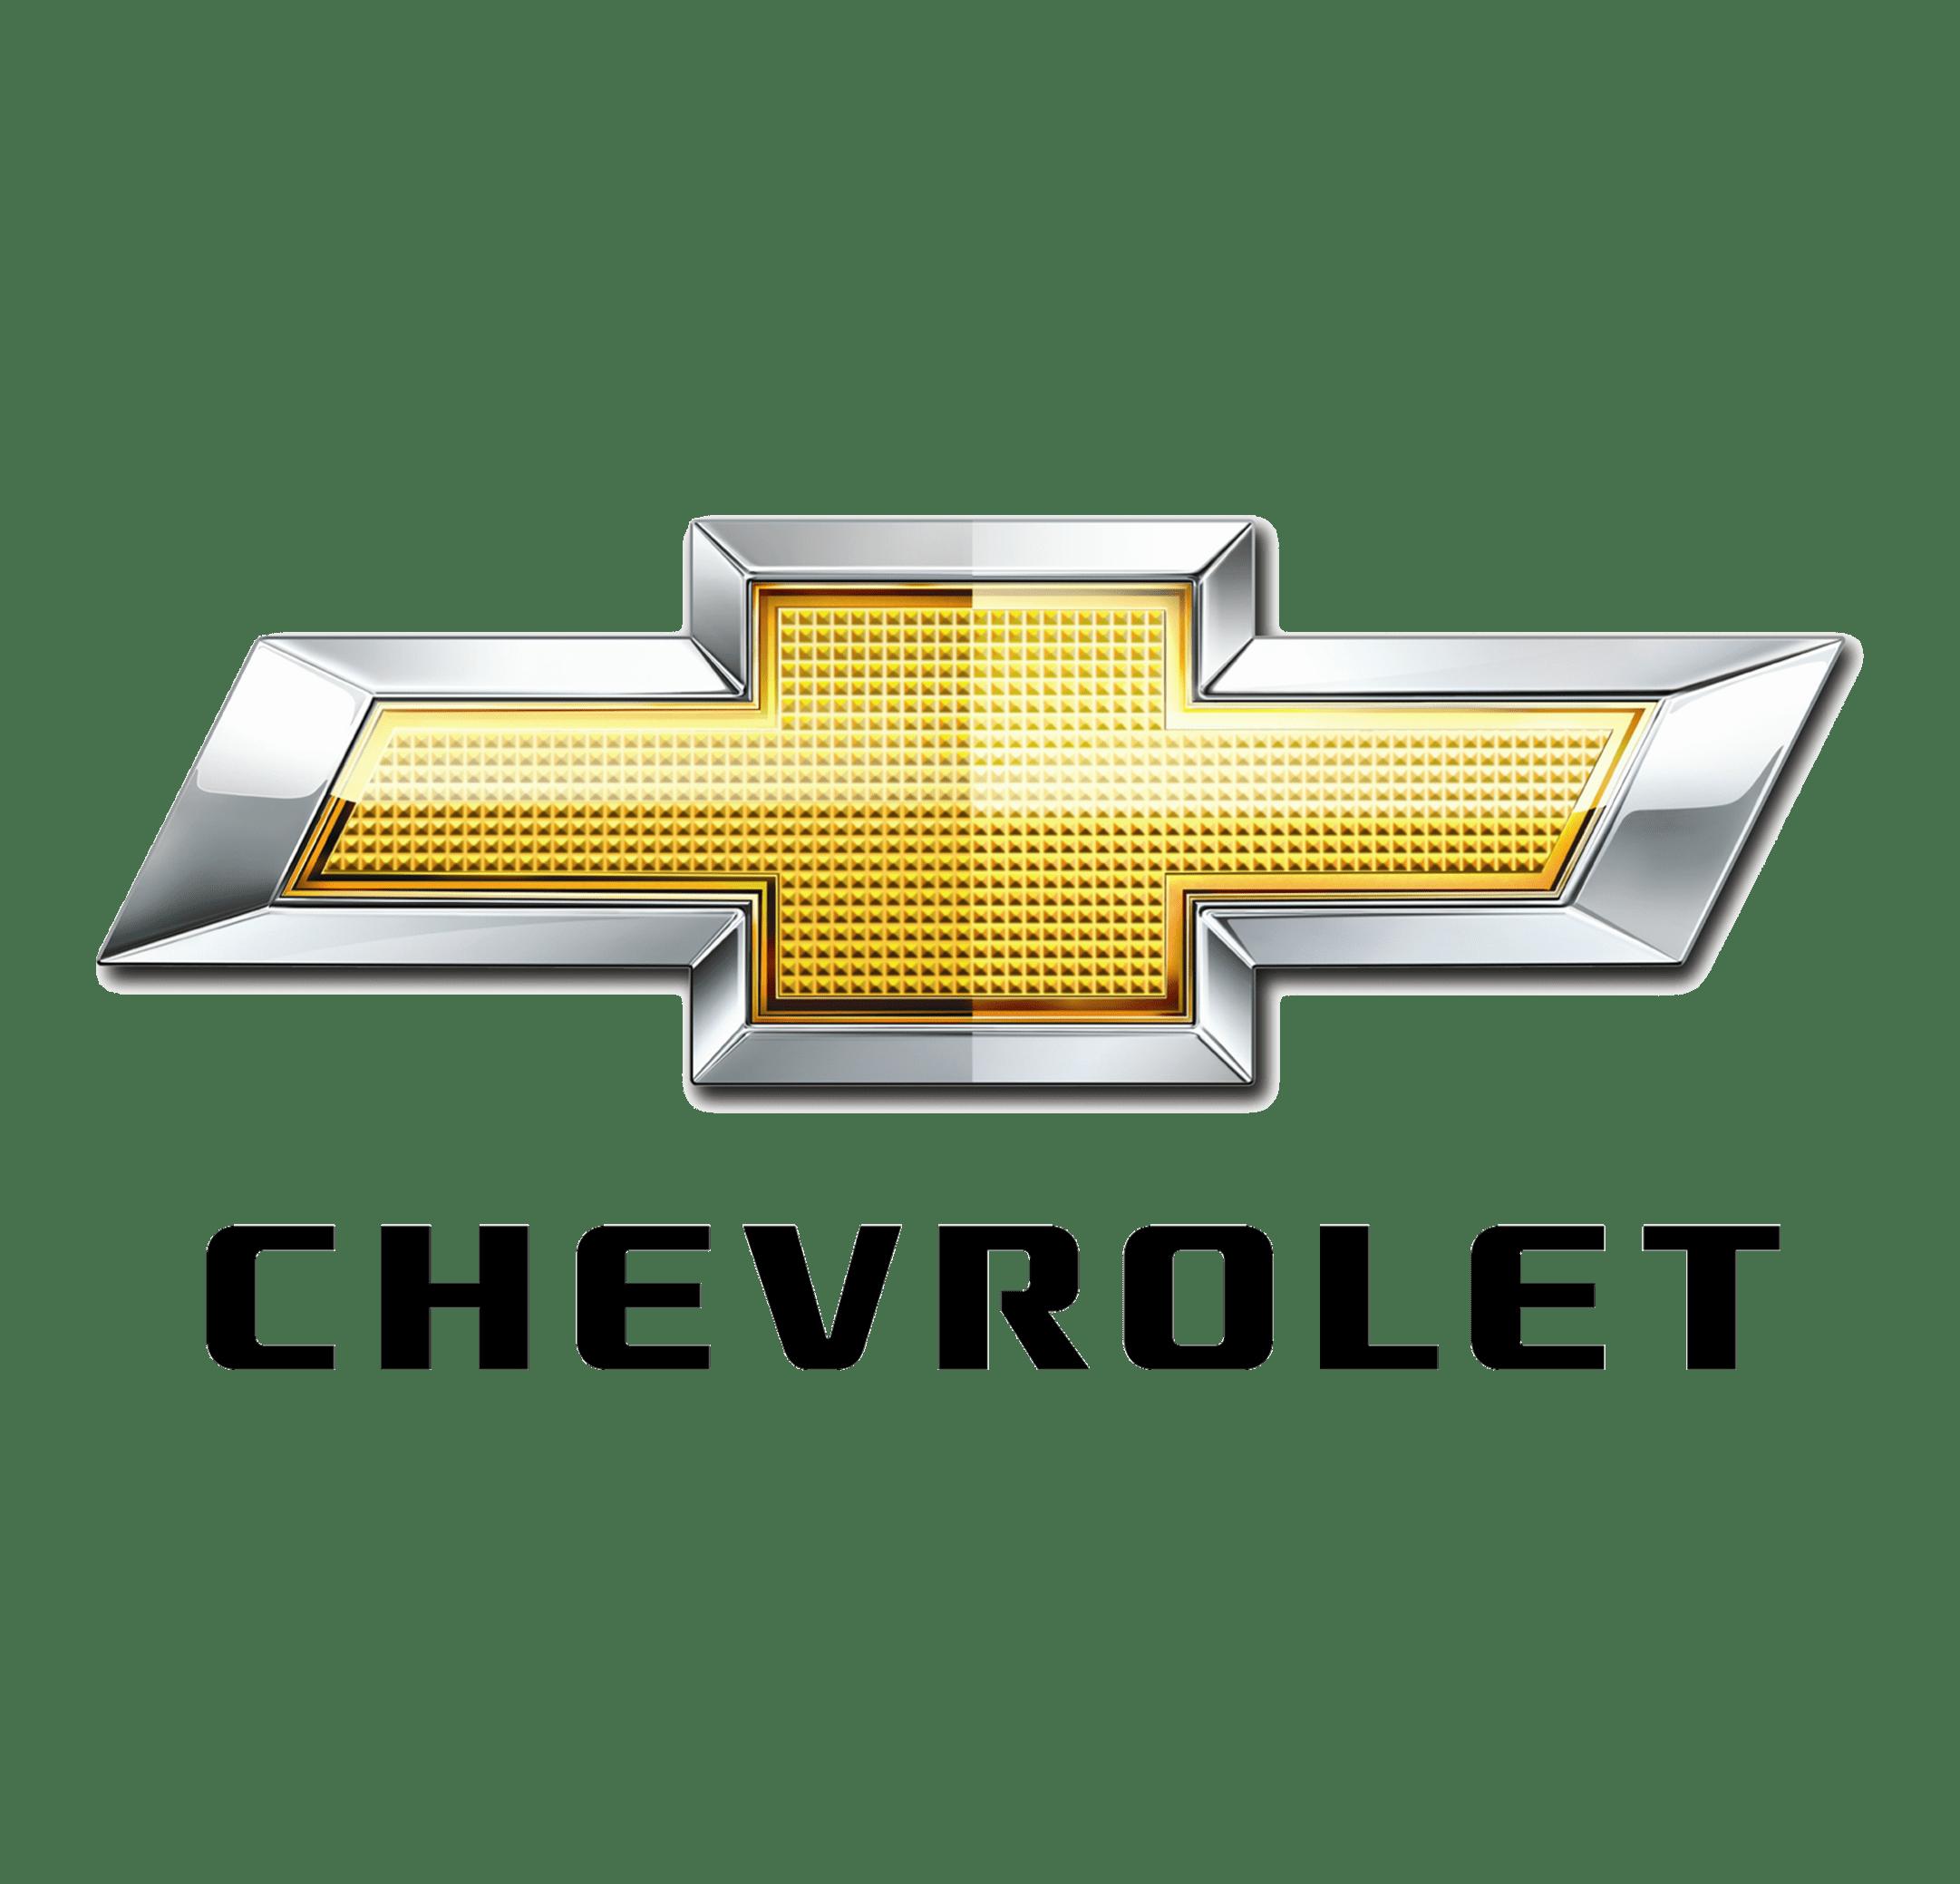 CHEVEROLET-min.png